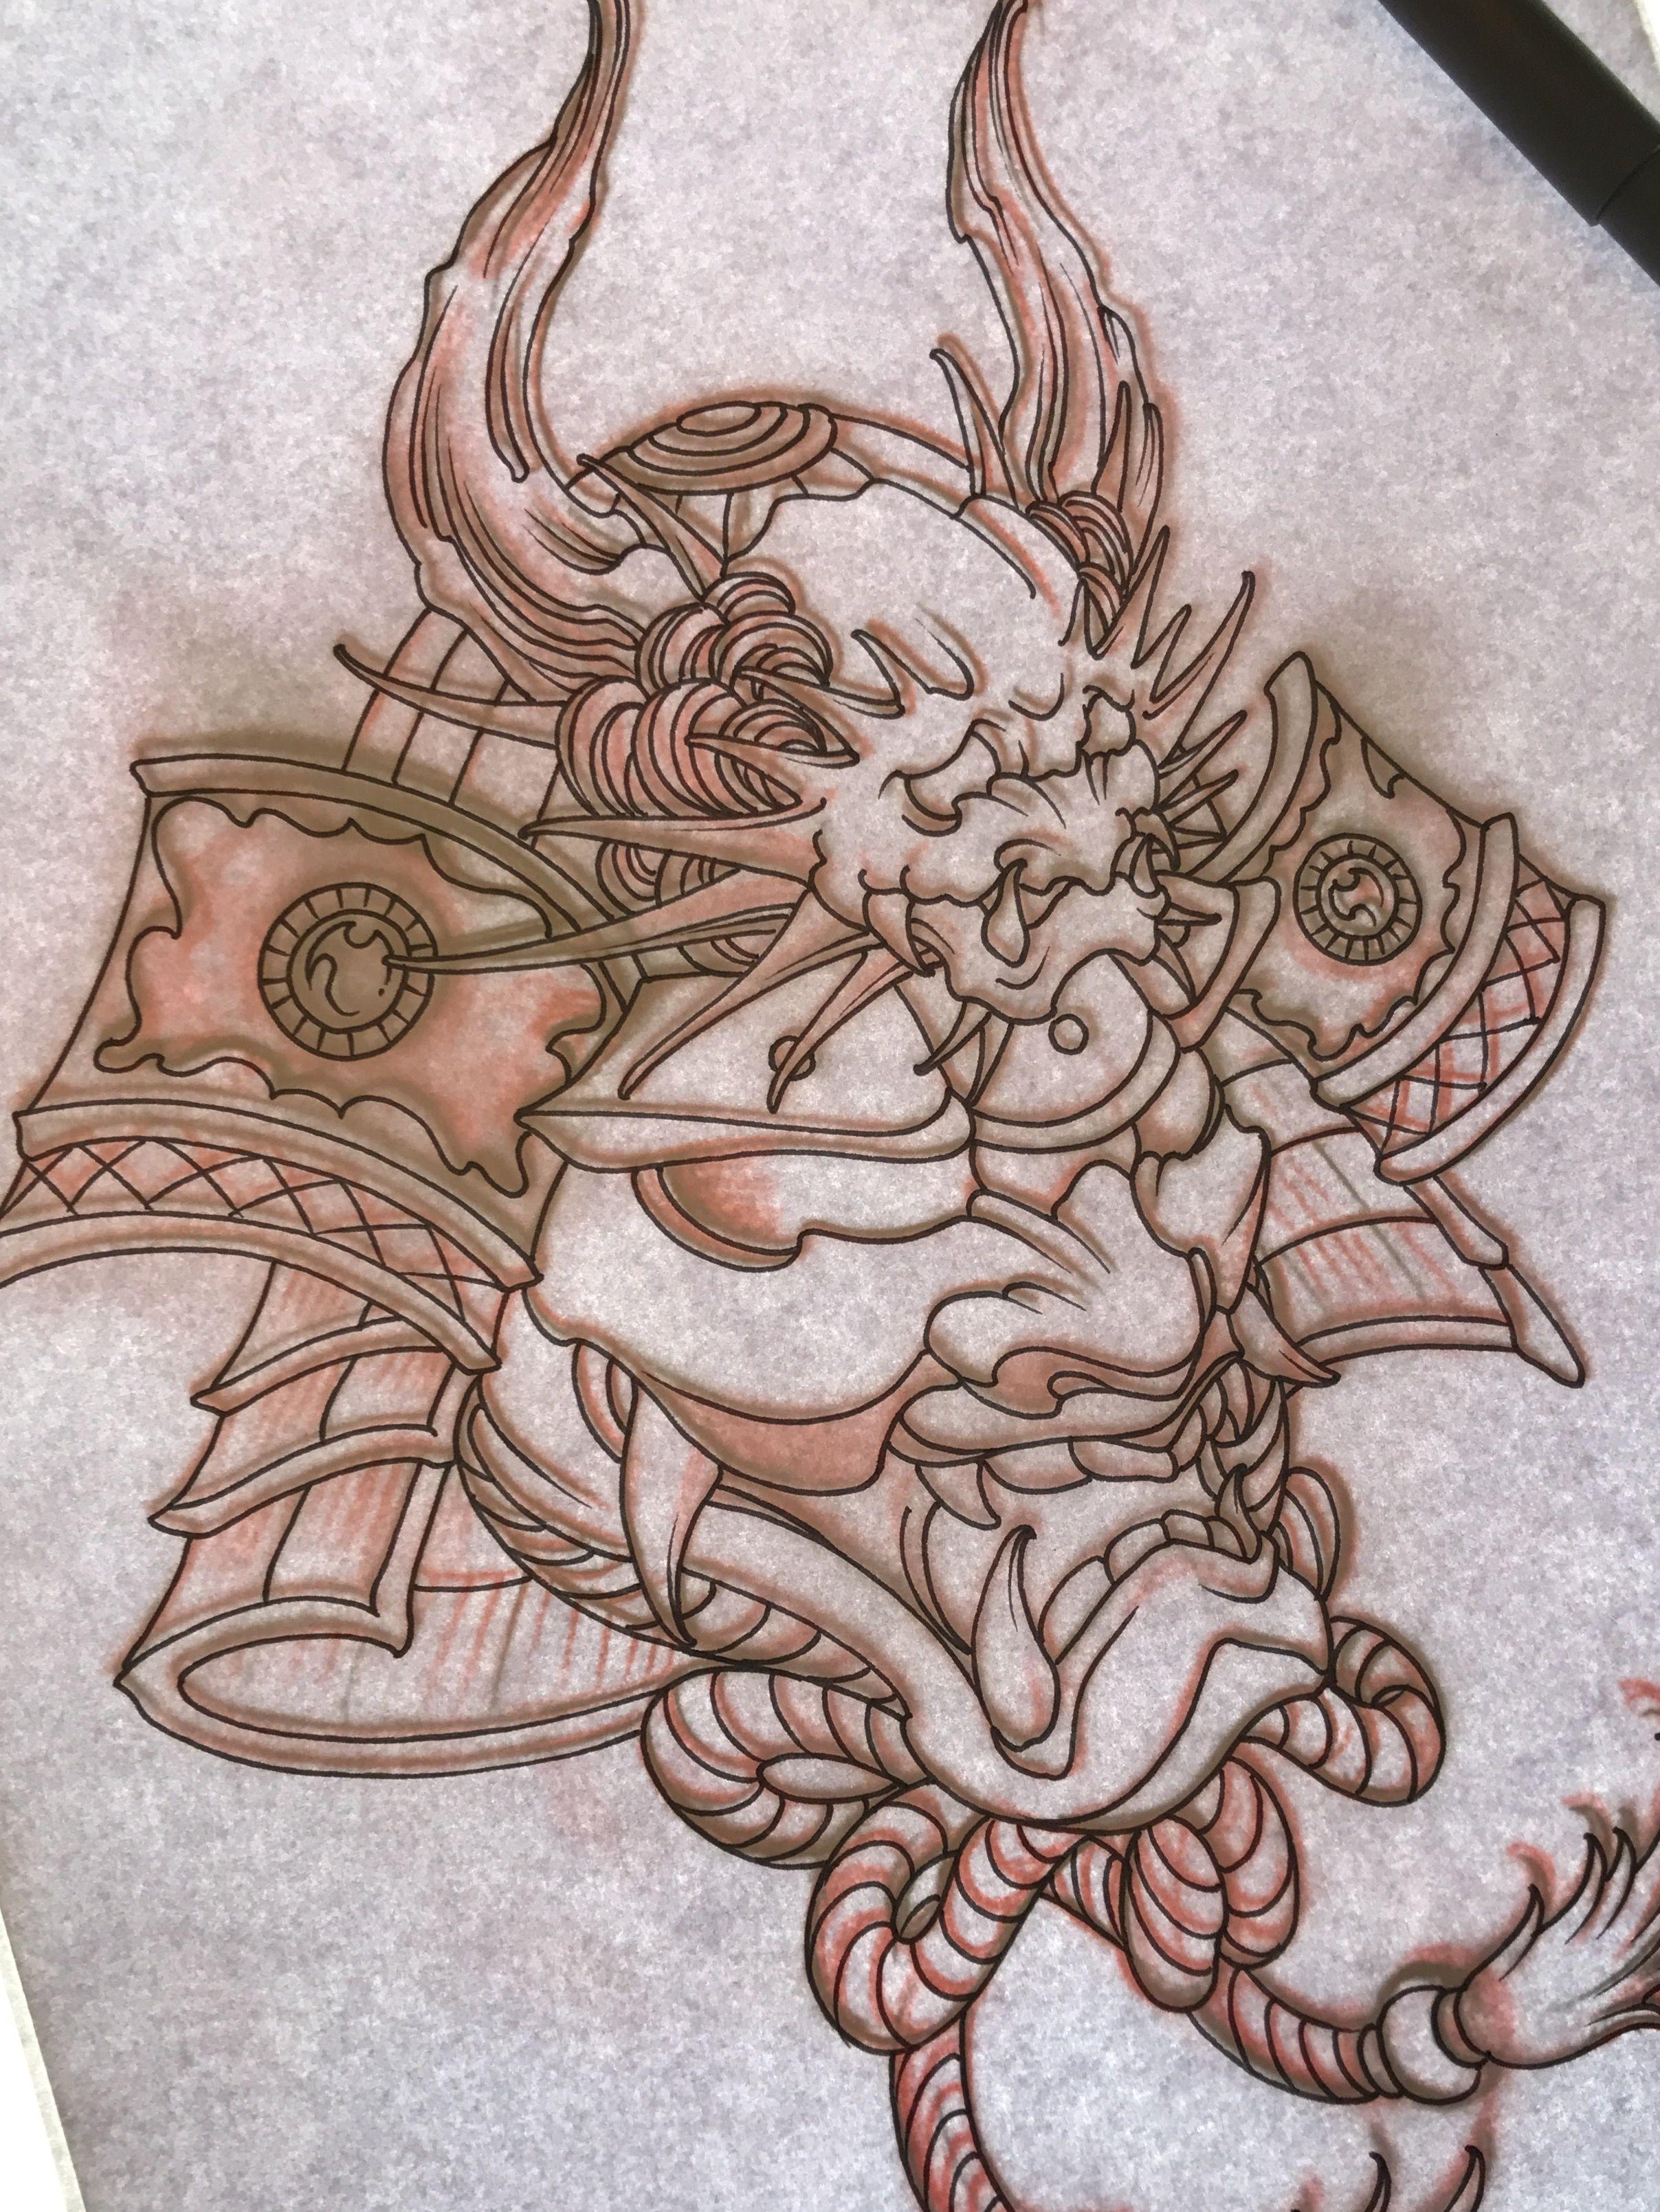 amsterdam tattoo1825 kimihito samurai mask tattoo design. Black Bedroom Furniture Sets. Home Design Ideas